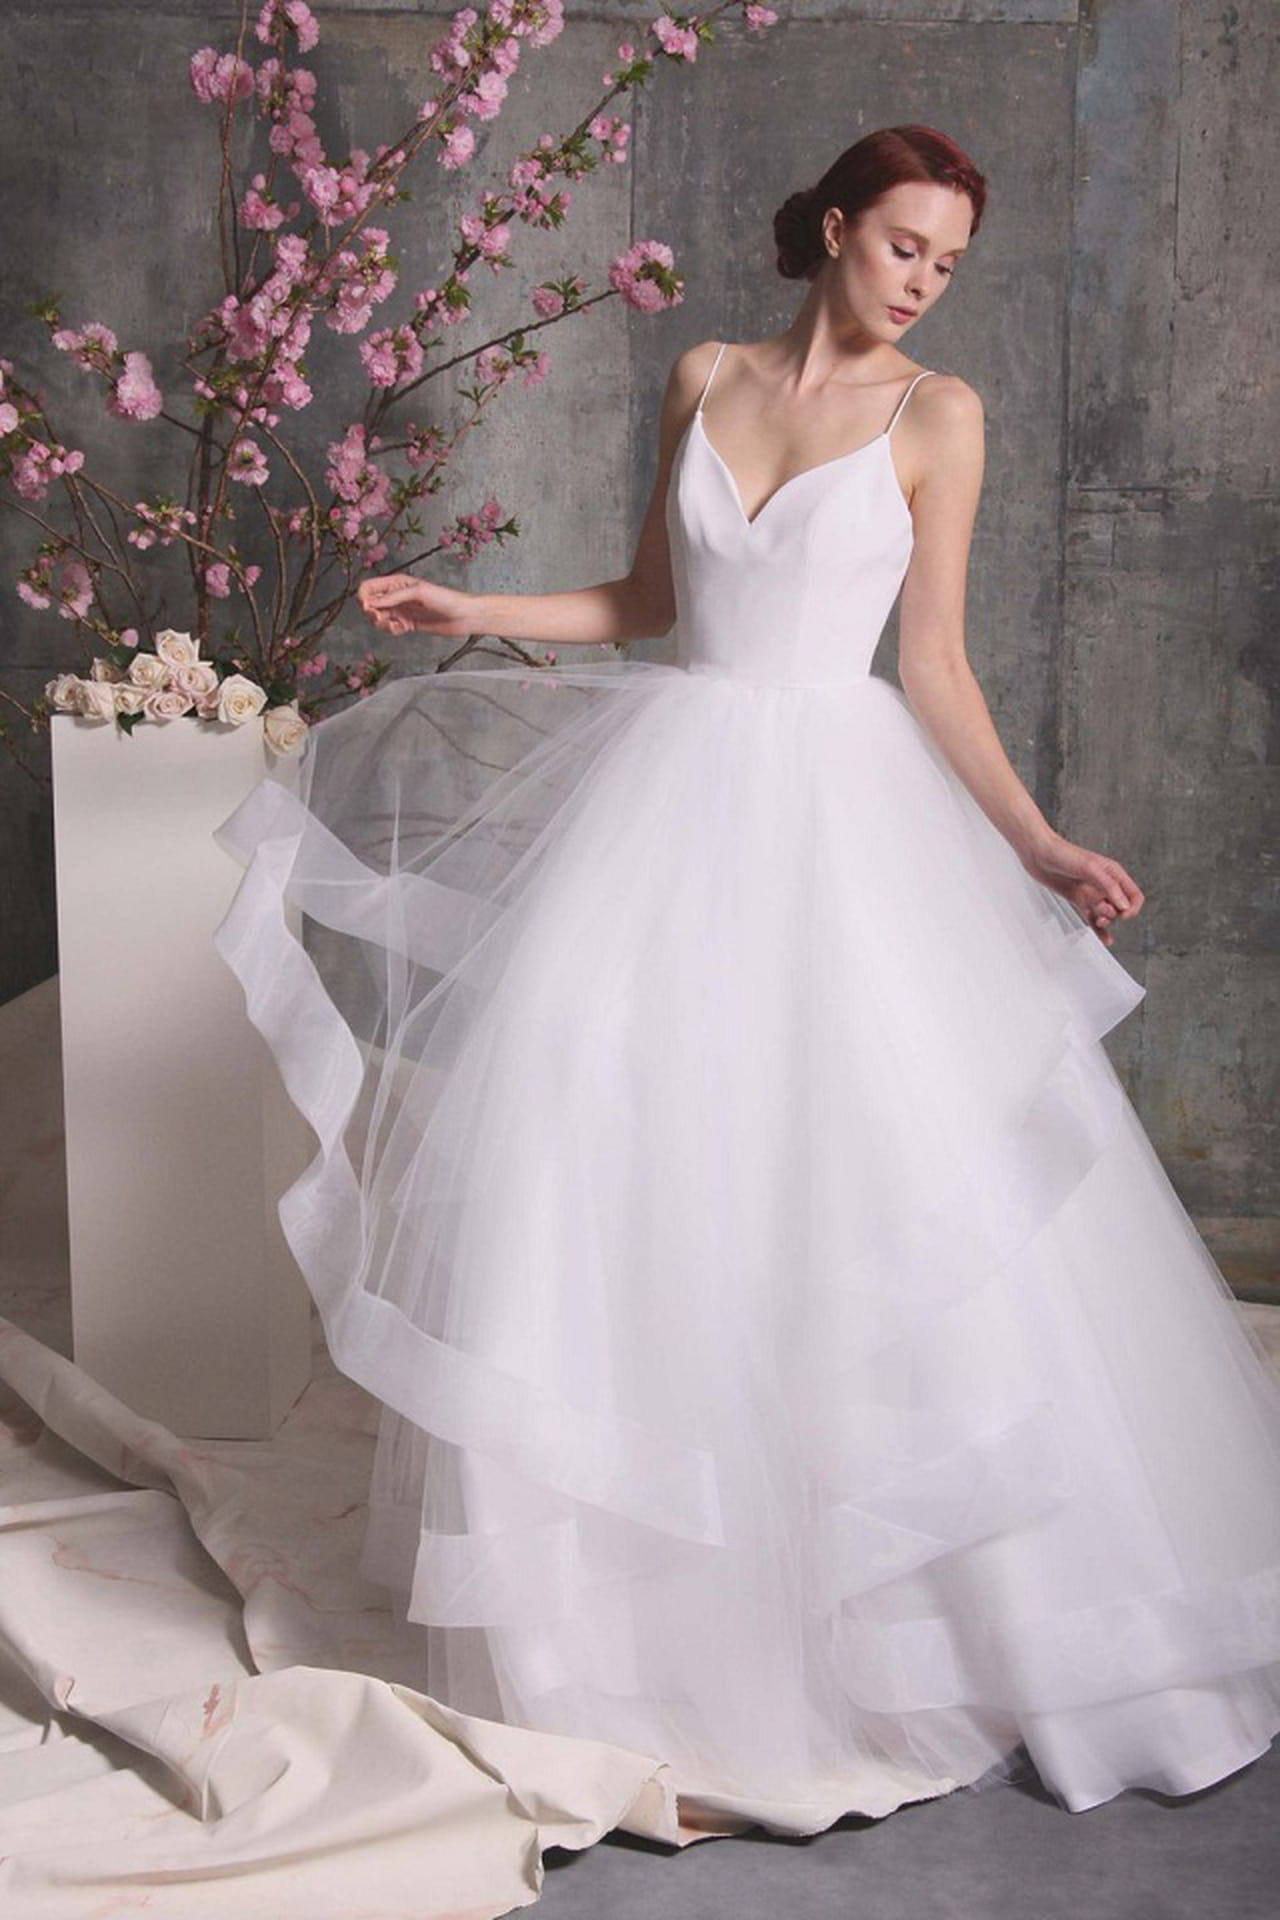 7fd54df474fc5 أسبوع الاناقة لفساتين الزفاف ربيع وصيف 2018- كريستيان سيريانو. Christian  Siriano Bridal Fashion ...